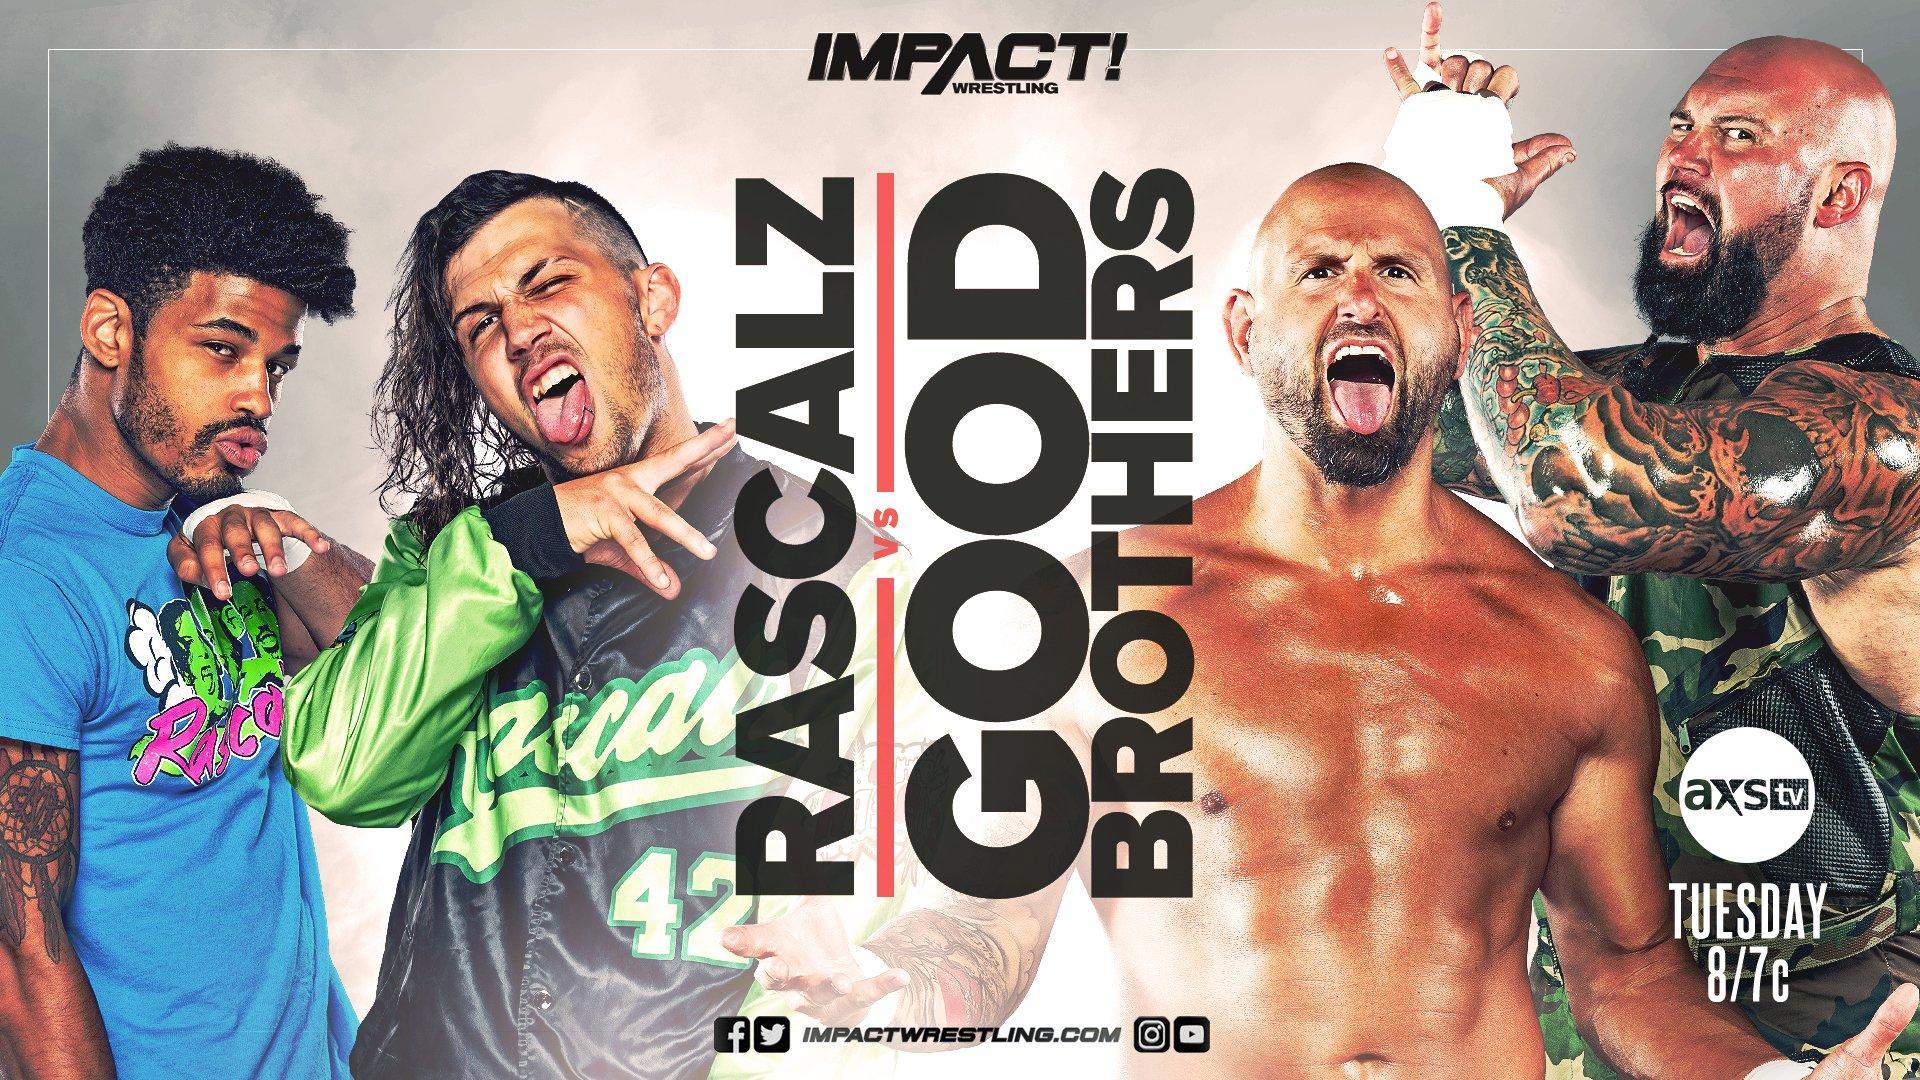 IMPACT Wrestling on AXS TV